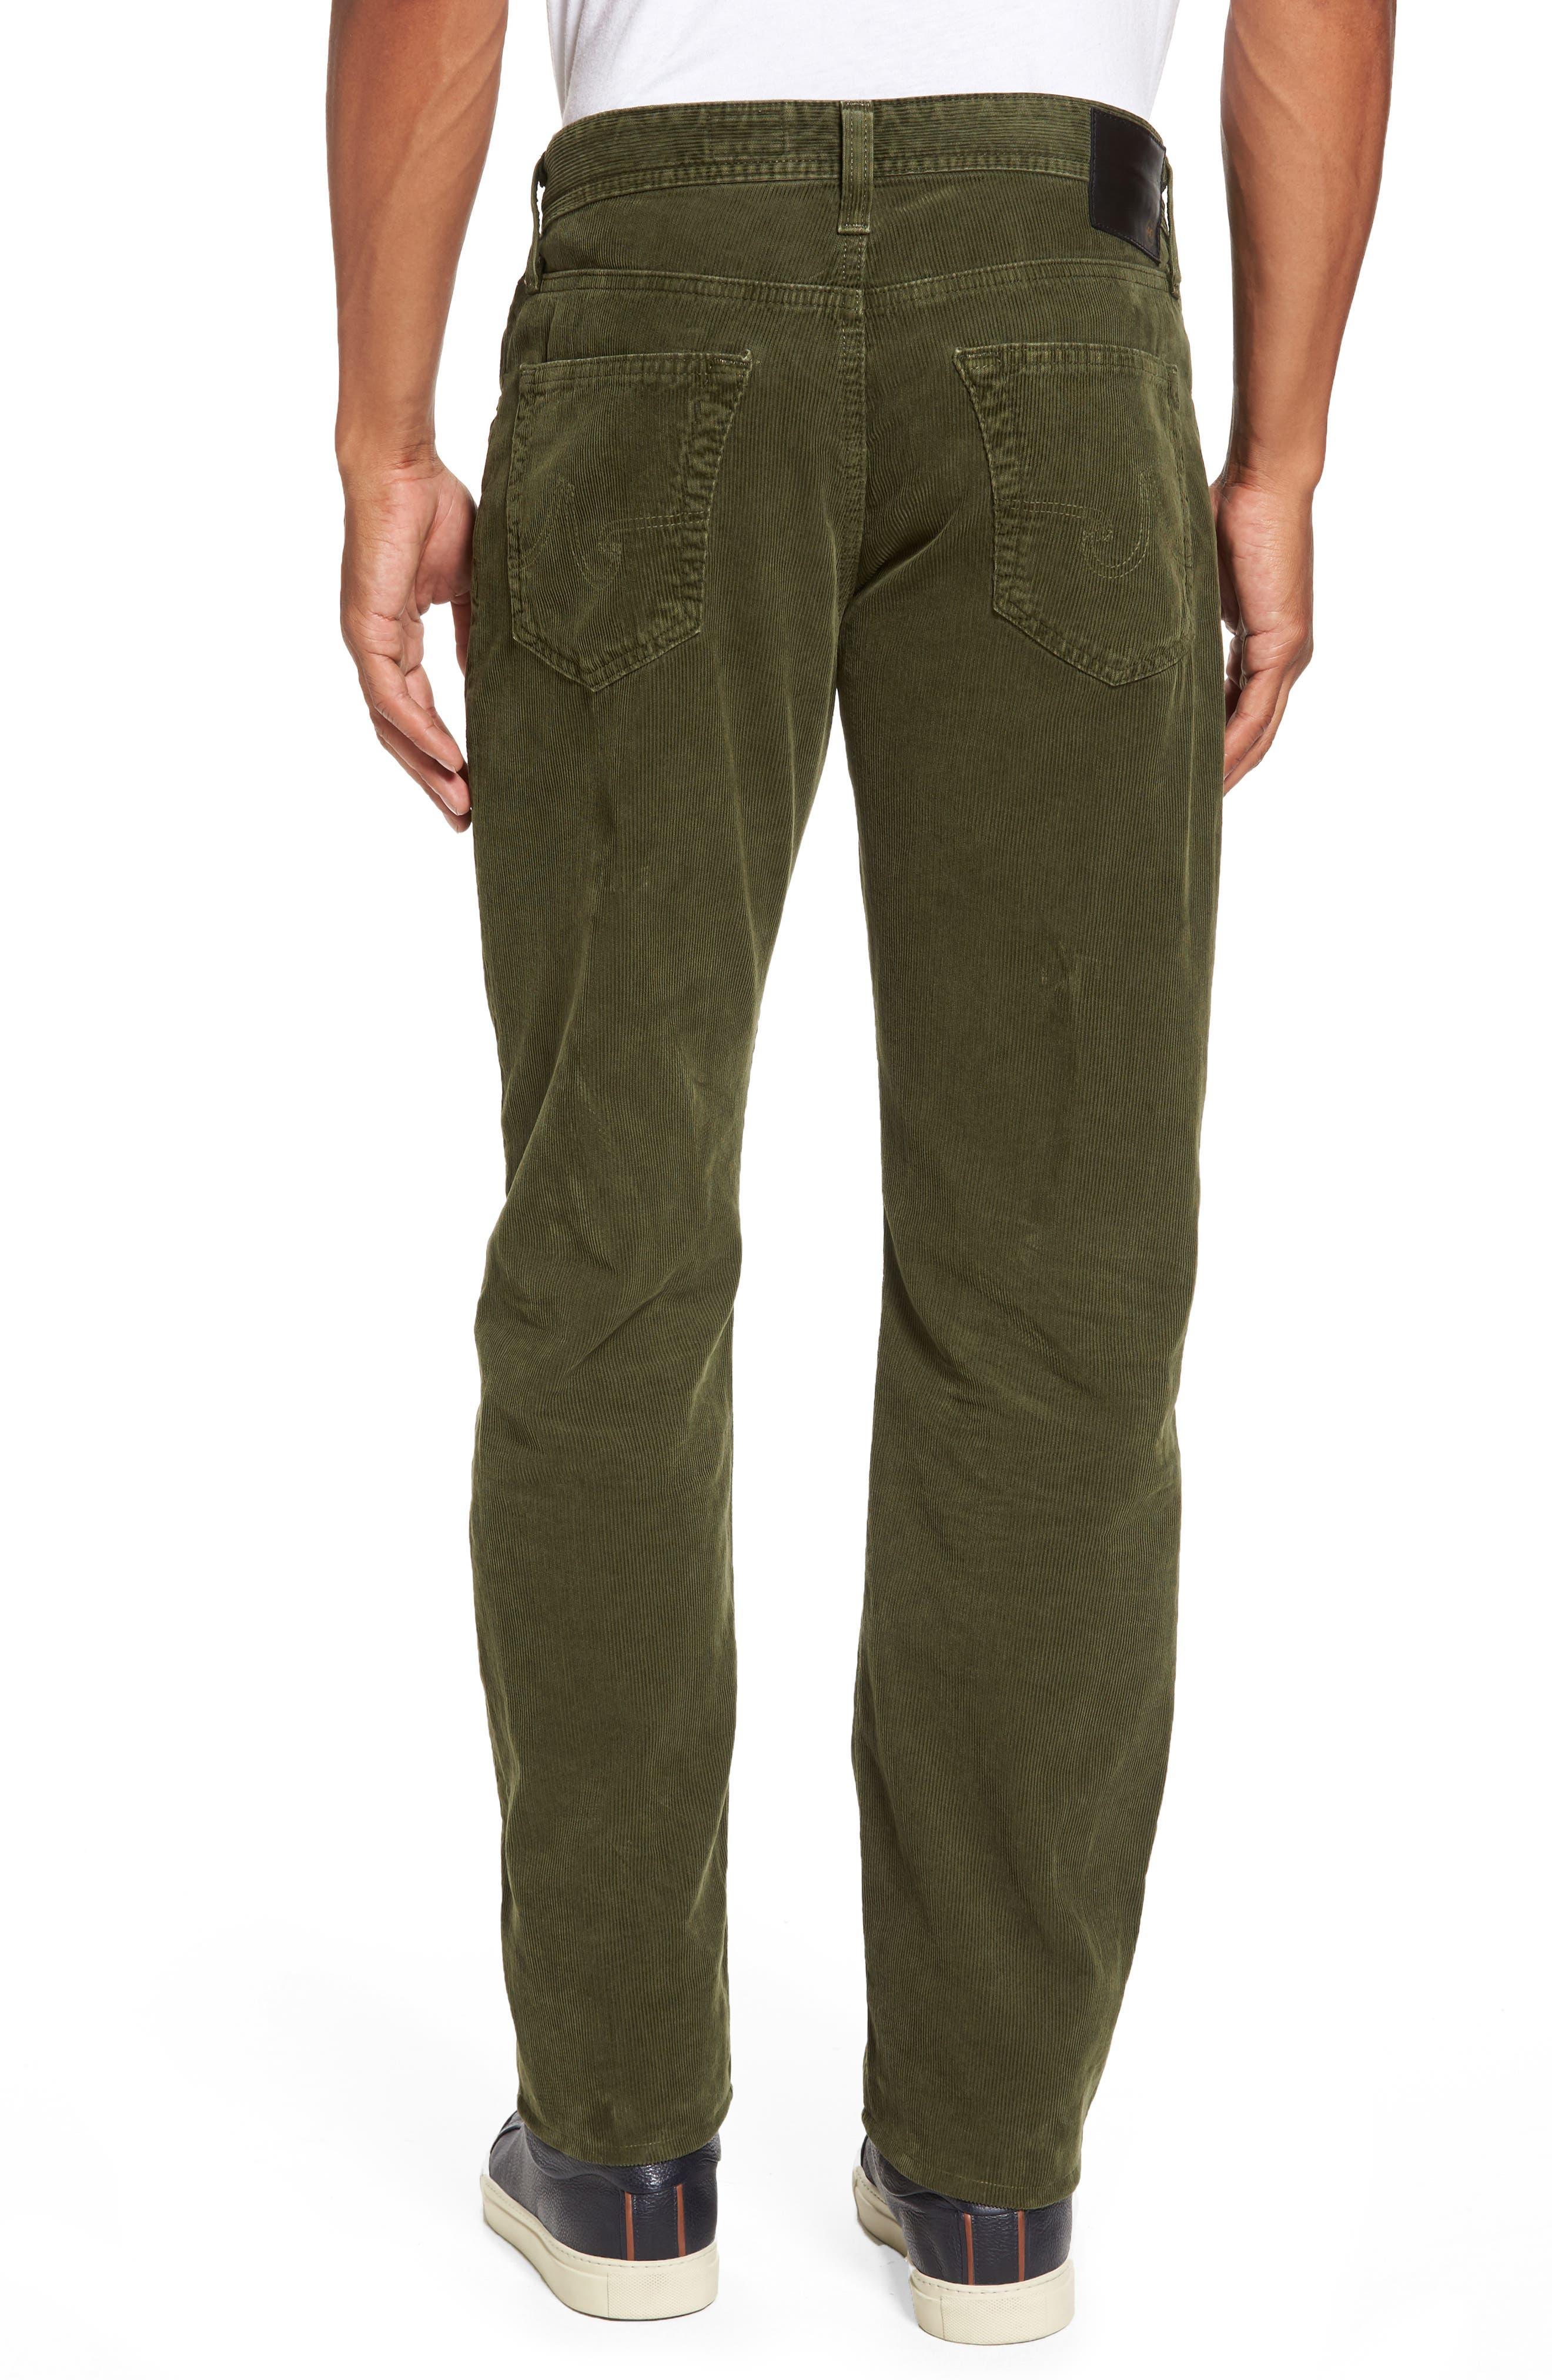 'Graduate' Tailored Straight Leg Corduroy Pants,                             Alternate thumbnail 2, color,                             Sulfur Climbing Ivy